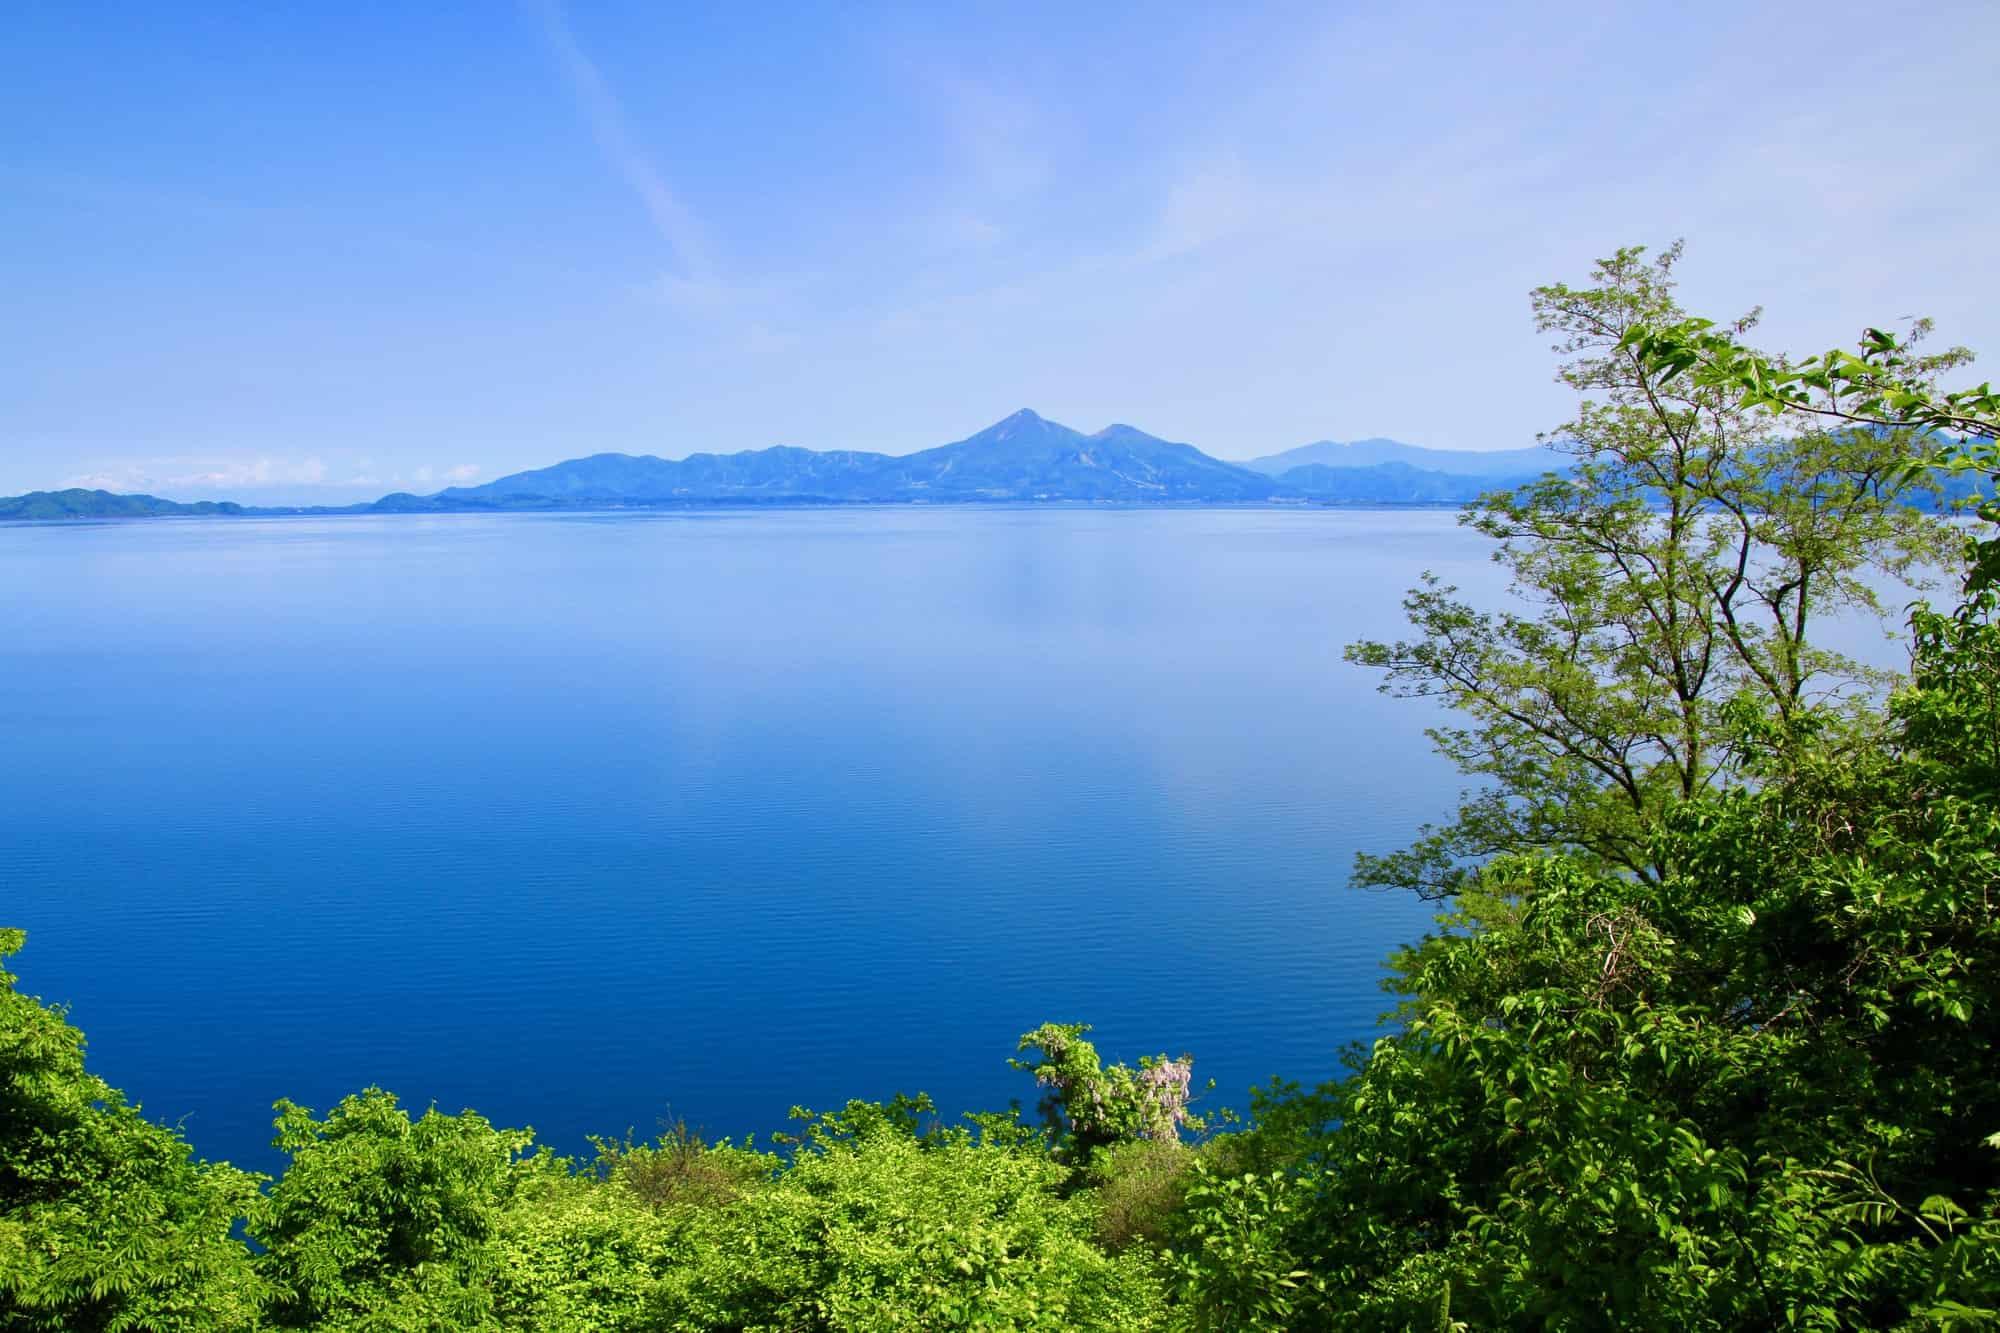 Lake Inawashiro and Mount Bandai